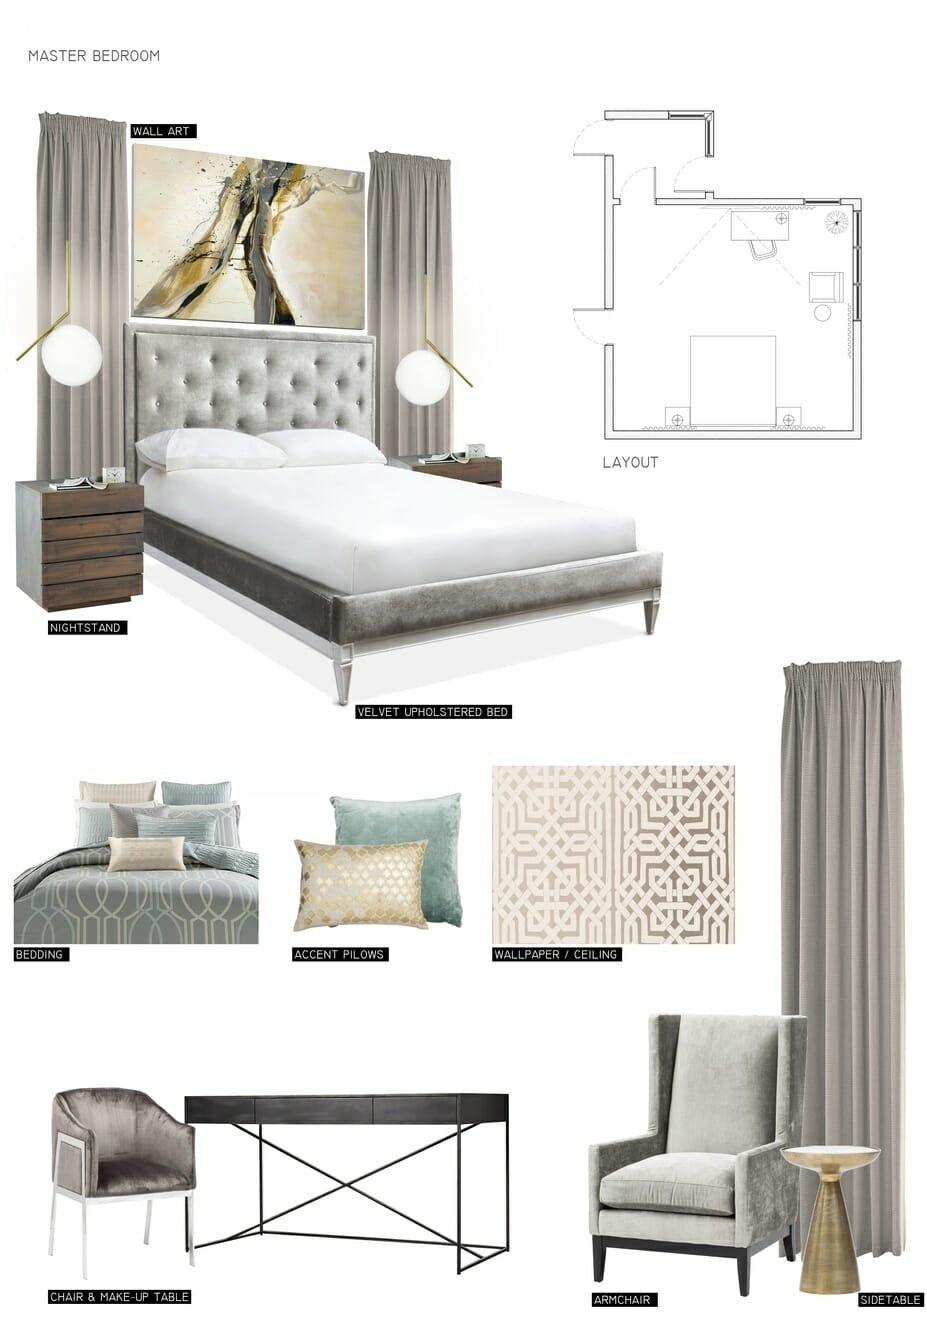 Before & After: Romantic Bedroom Online Interior Design ...